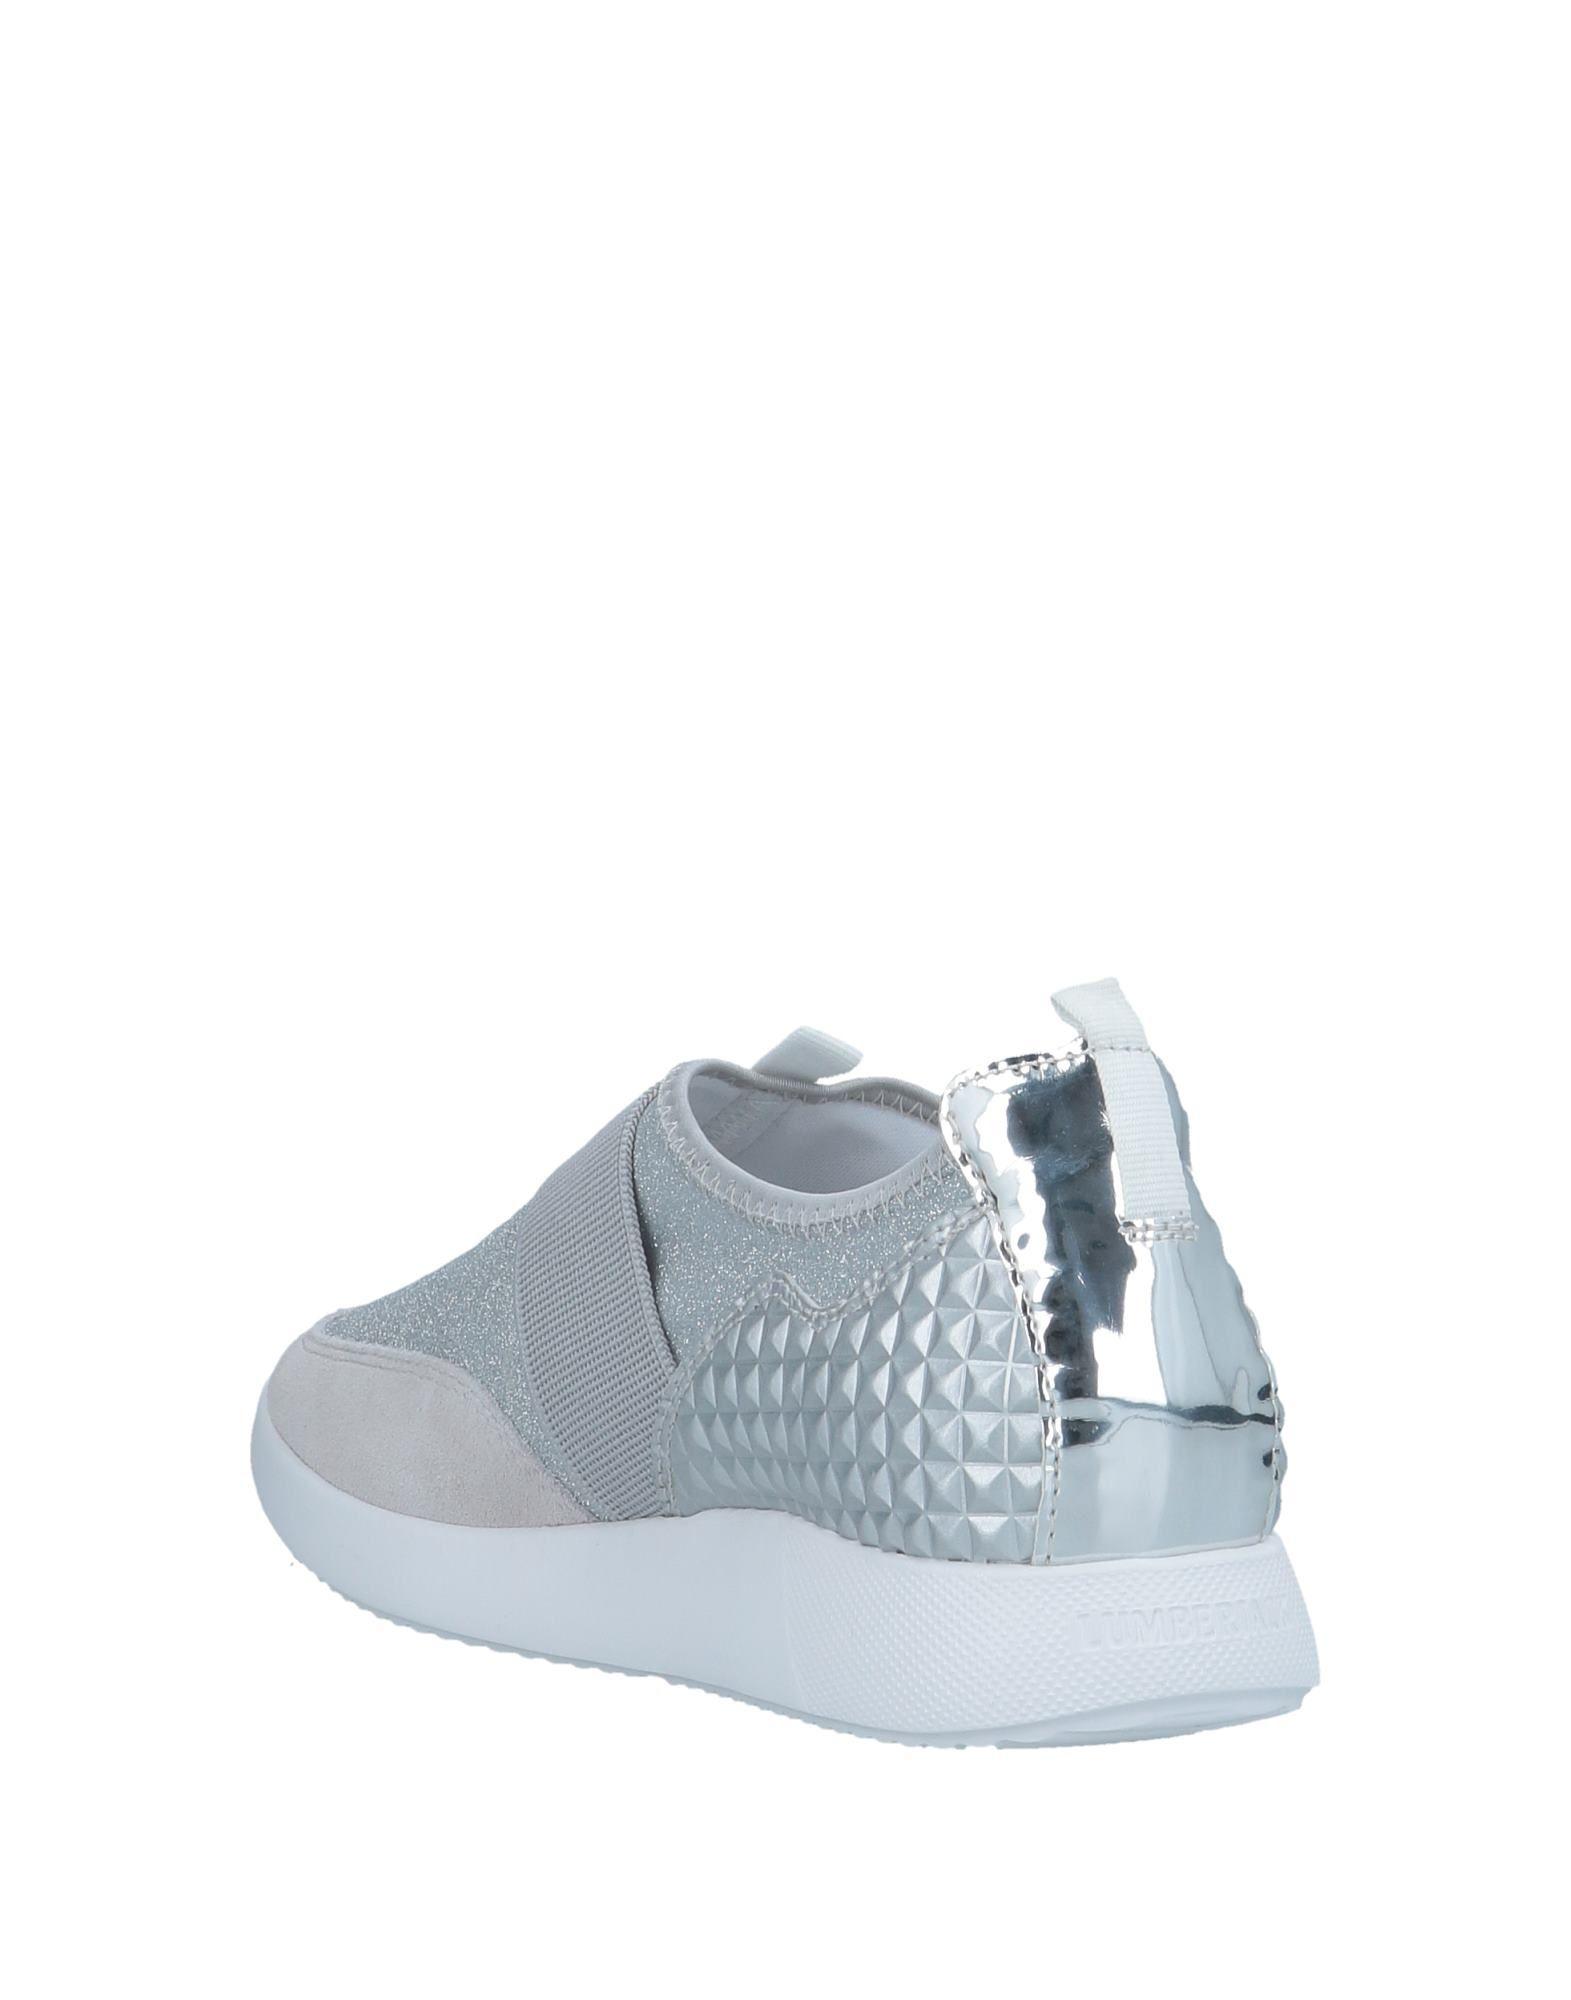 Lumberjack Sneakers Gute Damen  11197928QI Gute Sneakers Qualität beliebte Schuhe 244587